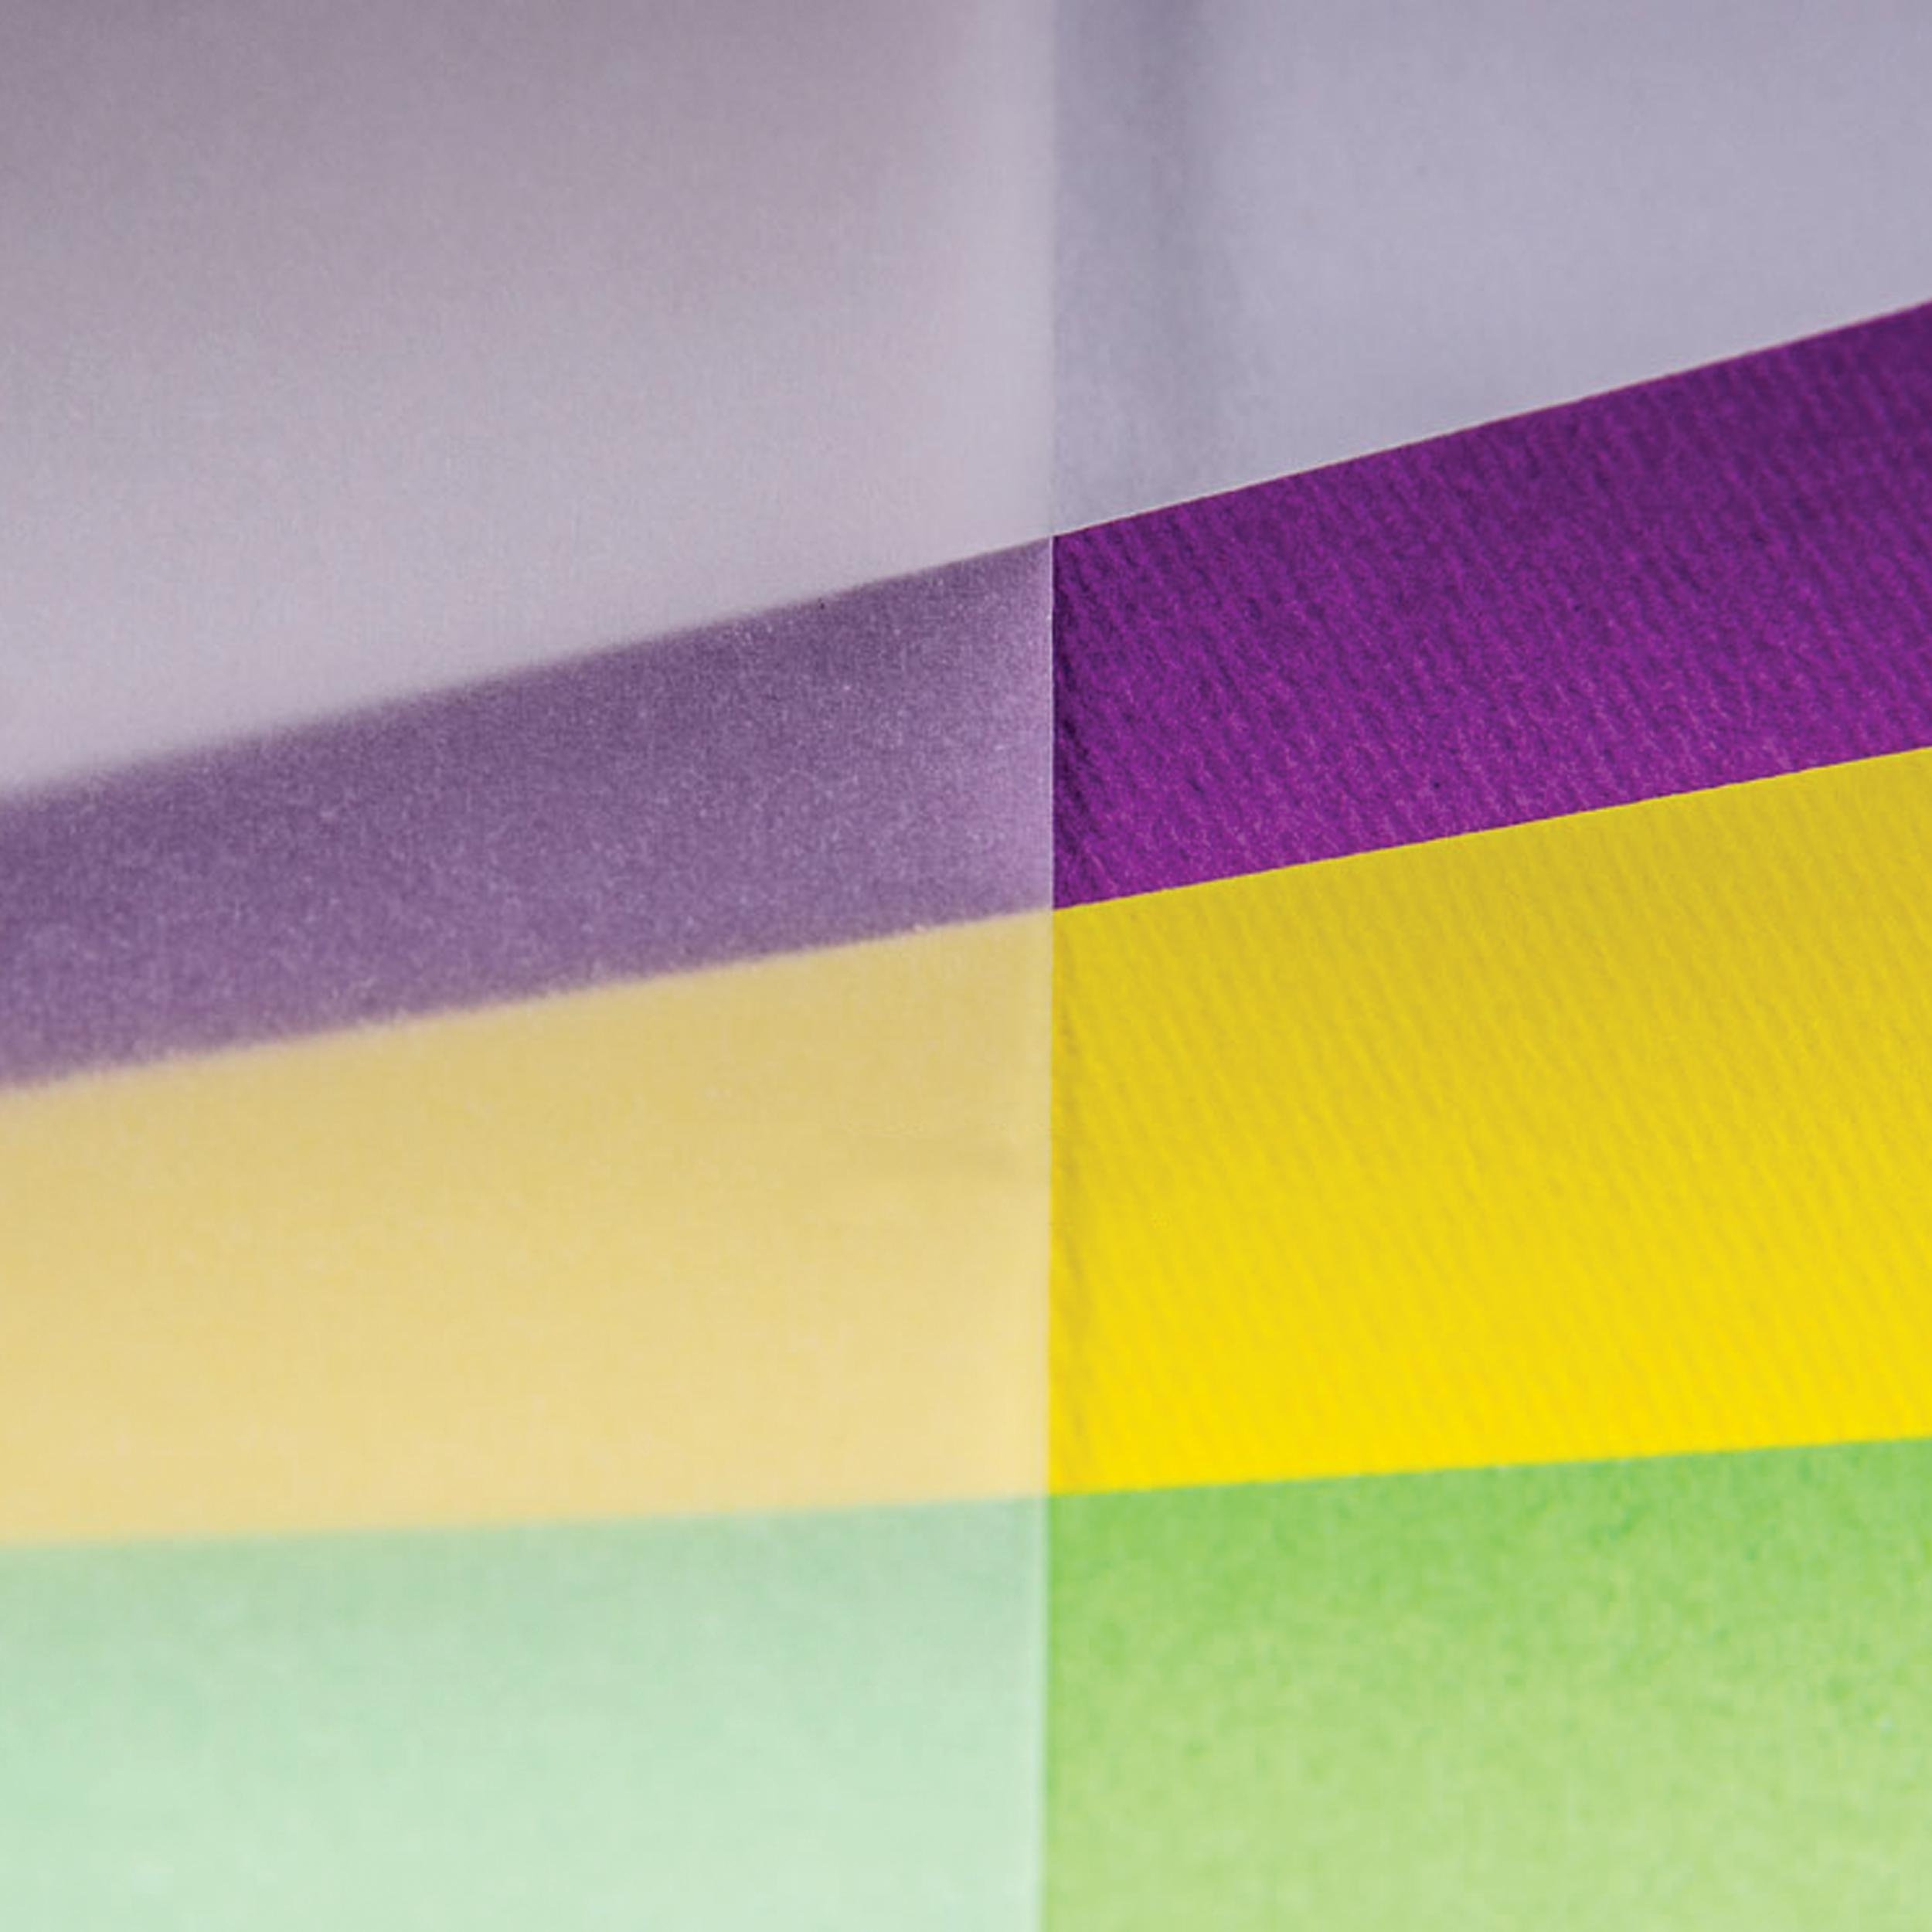 کاغذ پوستی A3 مدل cnd38 بسته 50 عددی  main 1 4